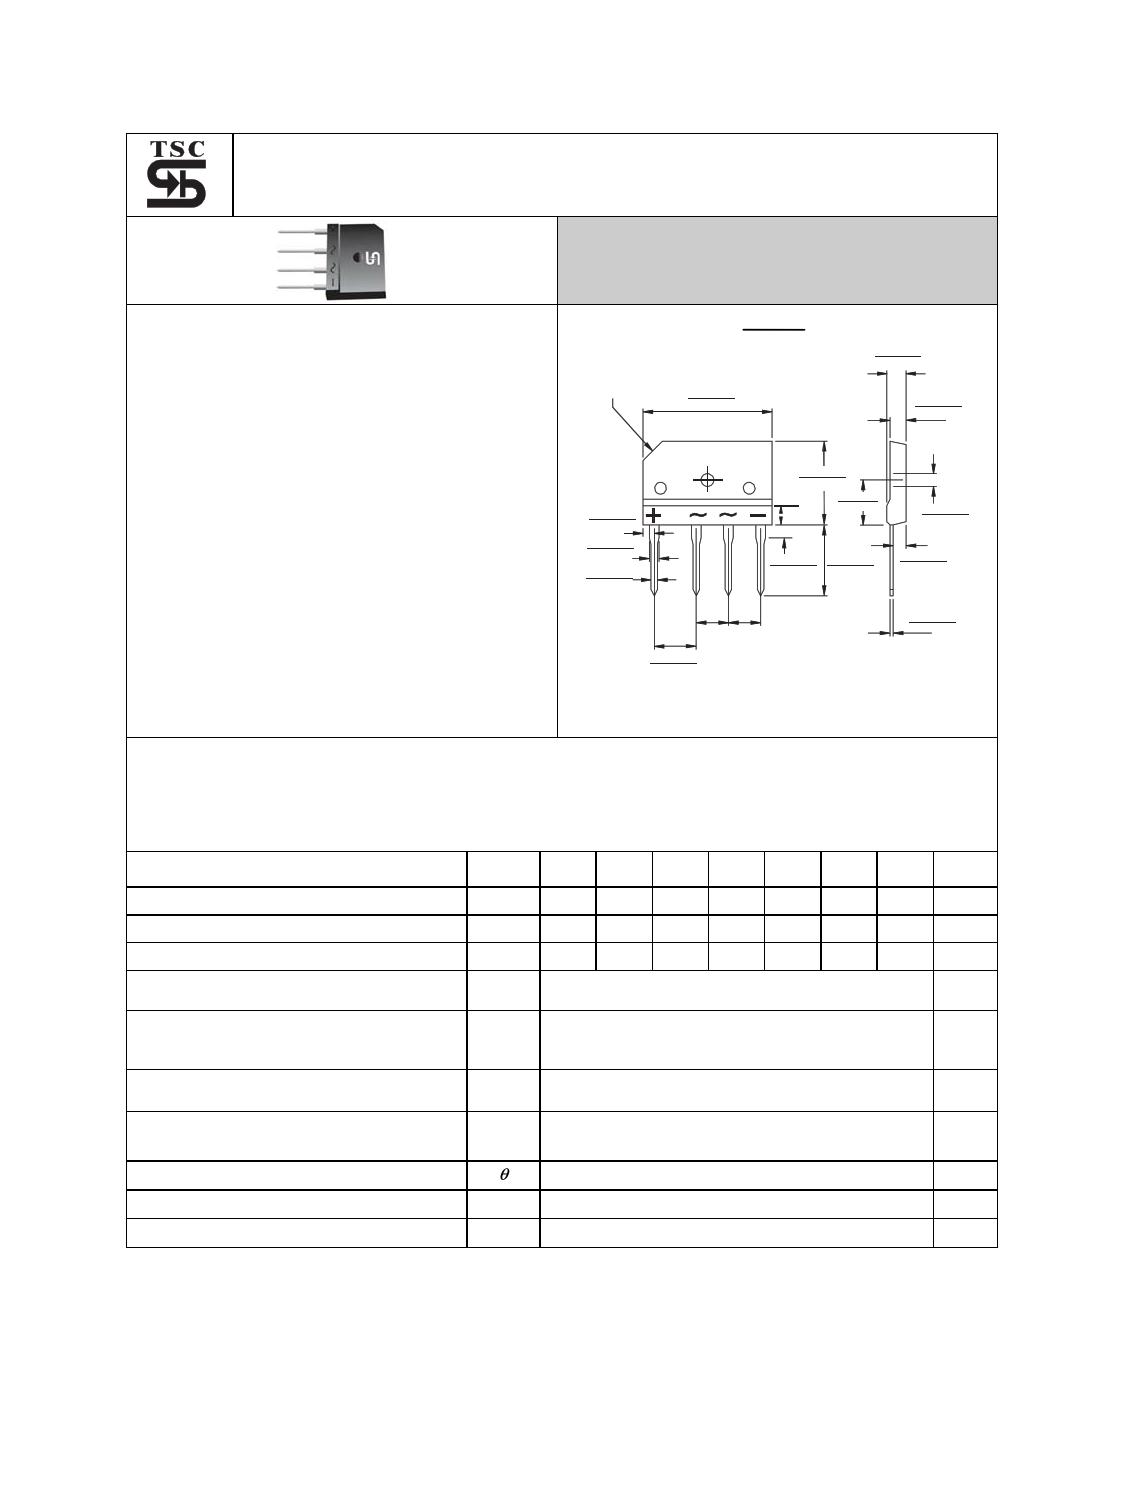 TS25P05G Datasheet, TS25P05G PDF,ピン配置, 機能